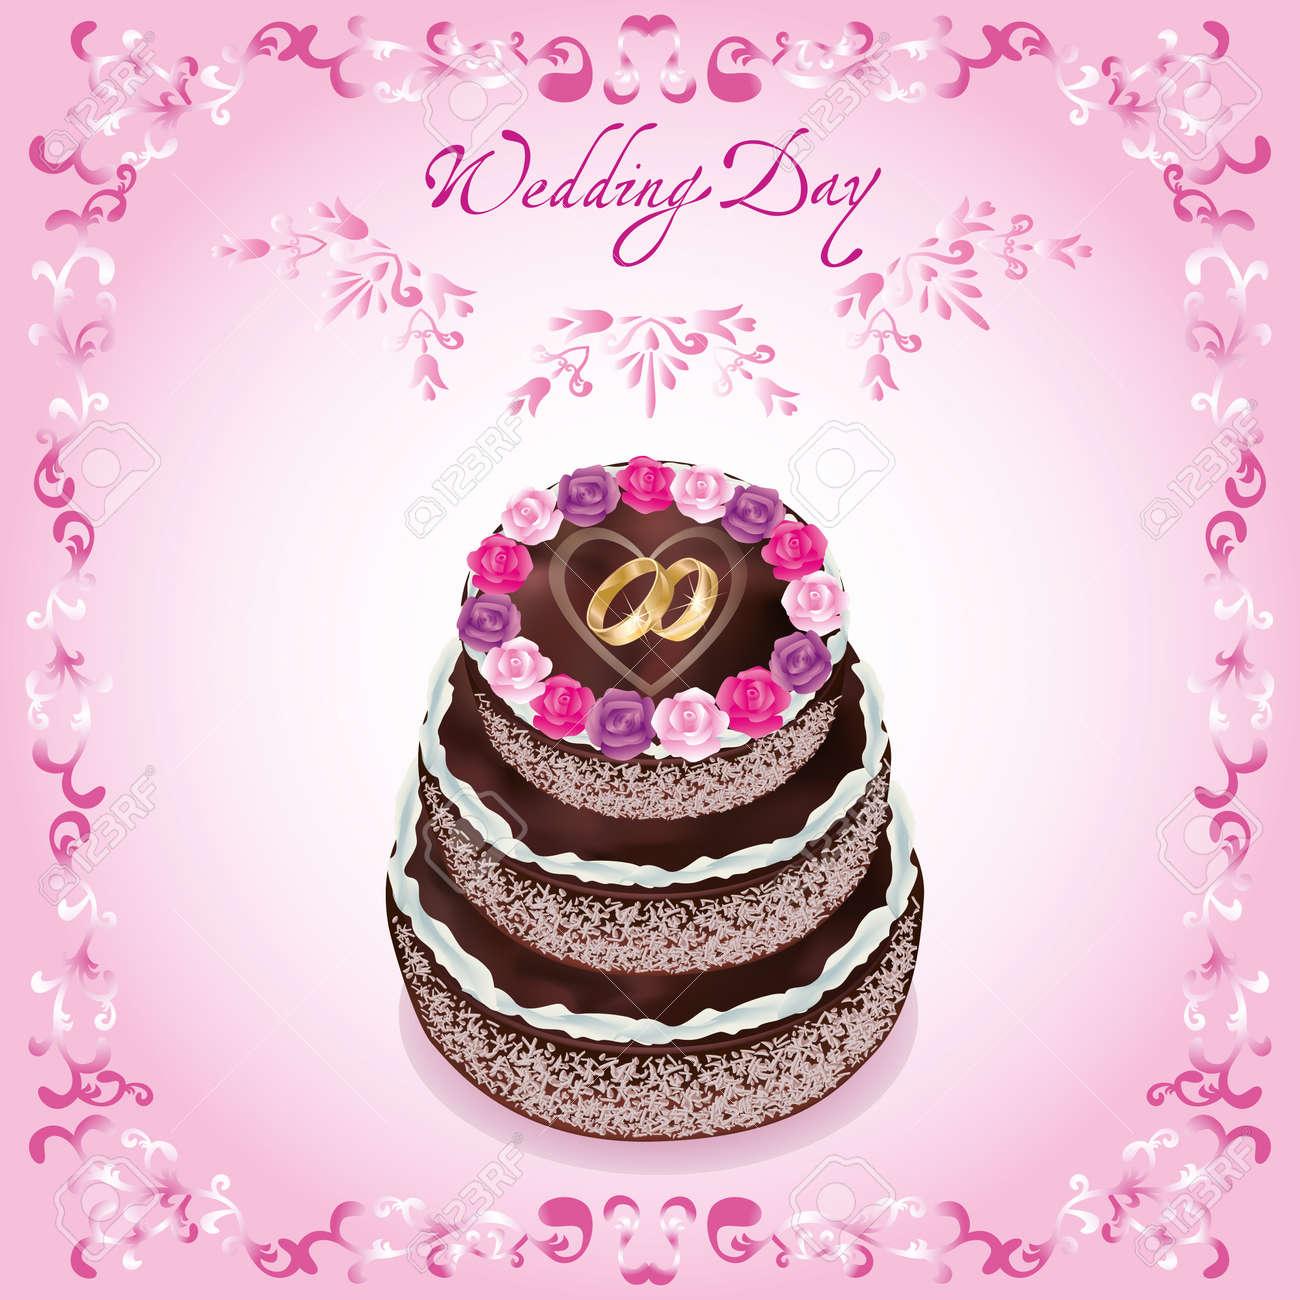 Wedding Greeting Or Invitation Card With Celebratory Cake, Decorated ...